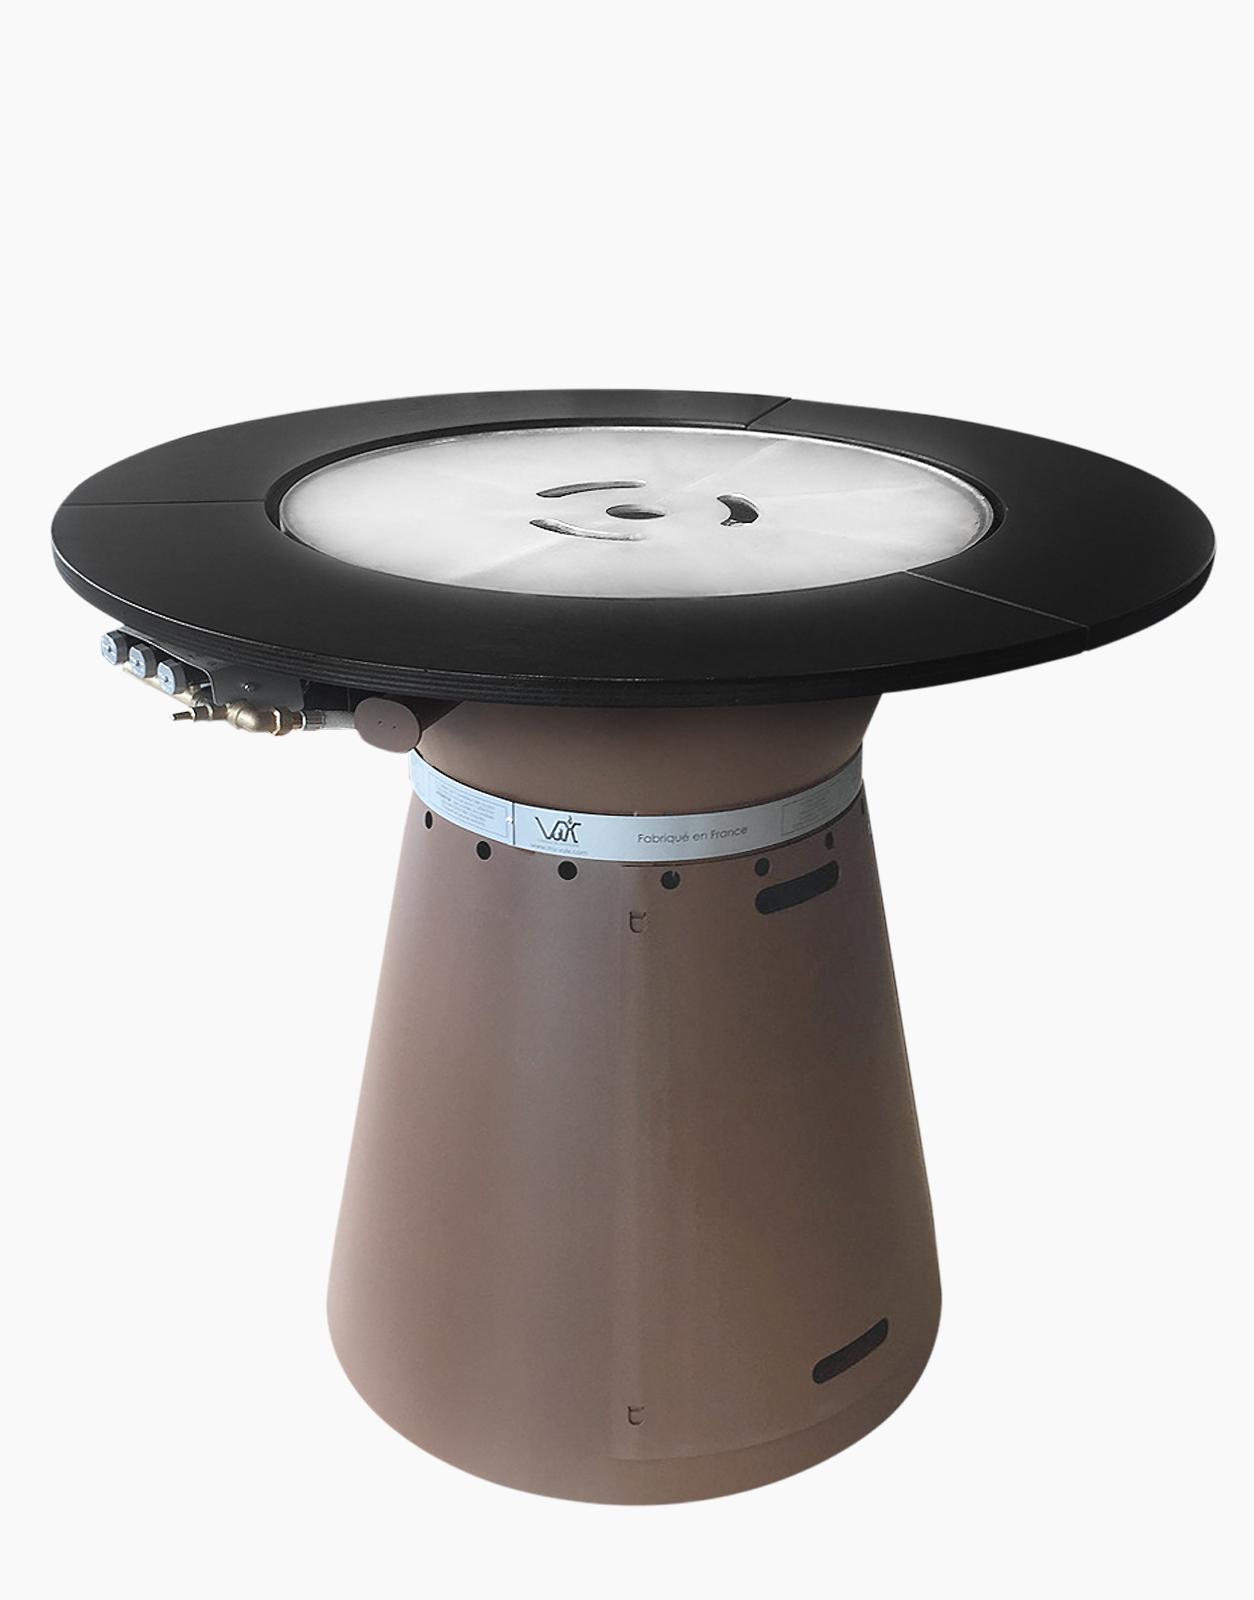 Brasero Plancha Fusion Gaz Solution Design Fr Furniture